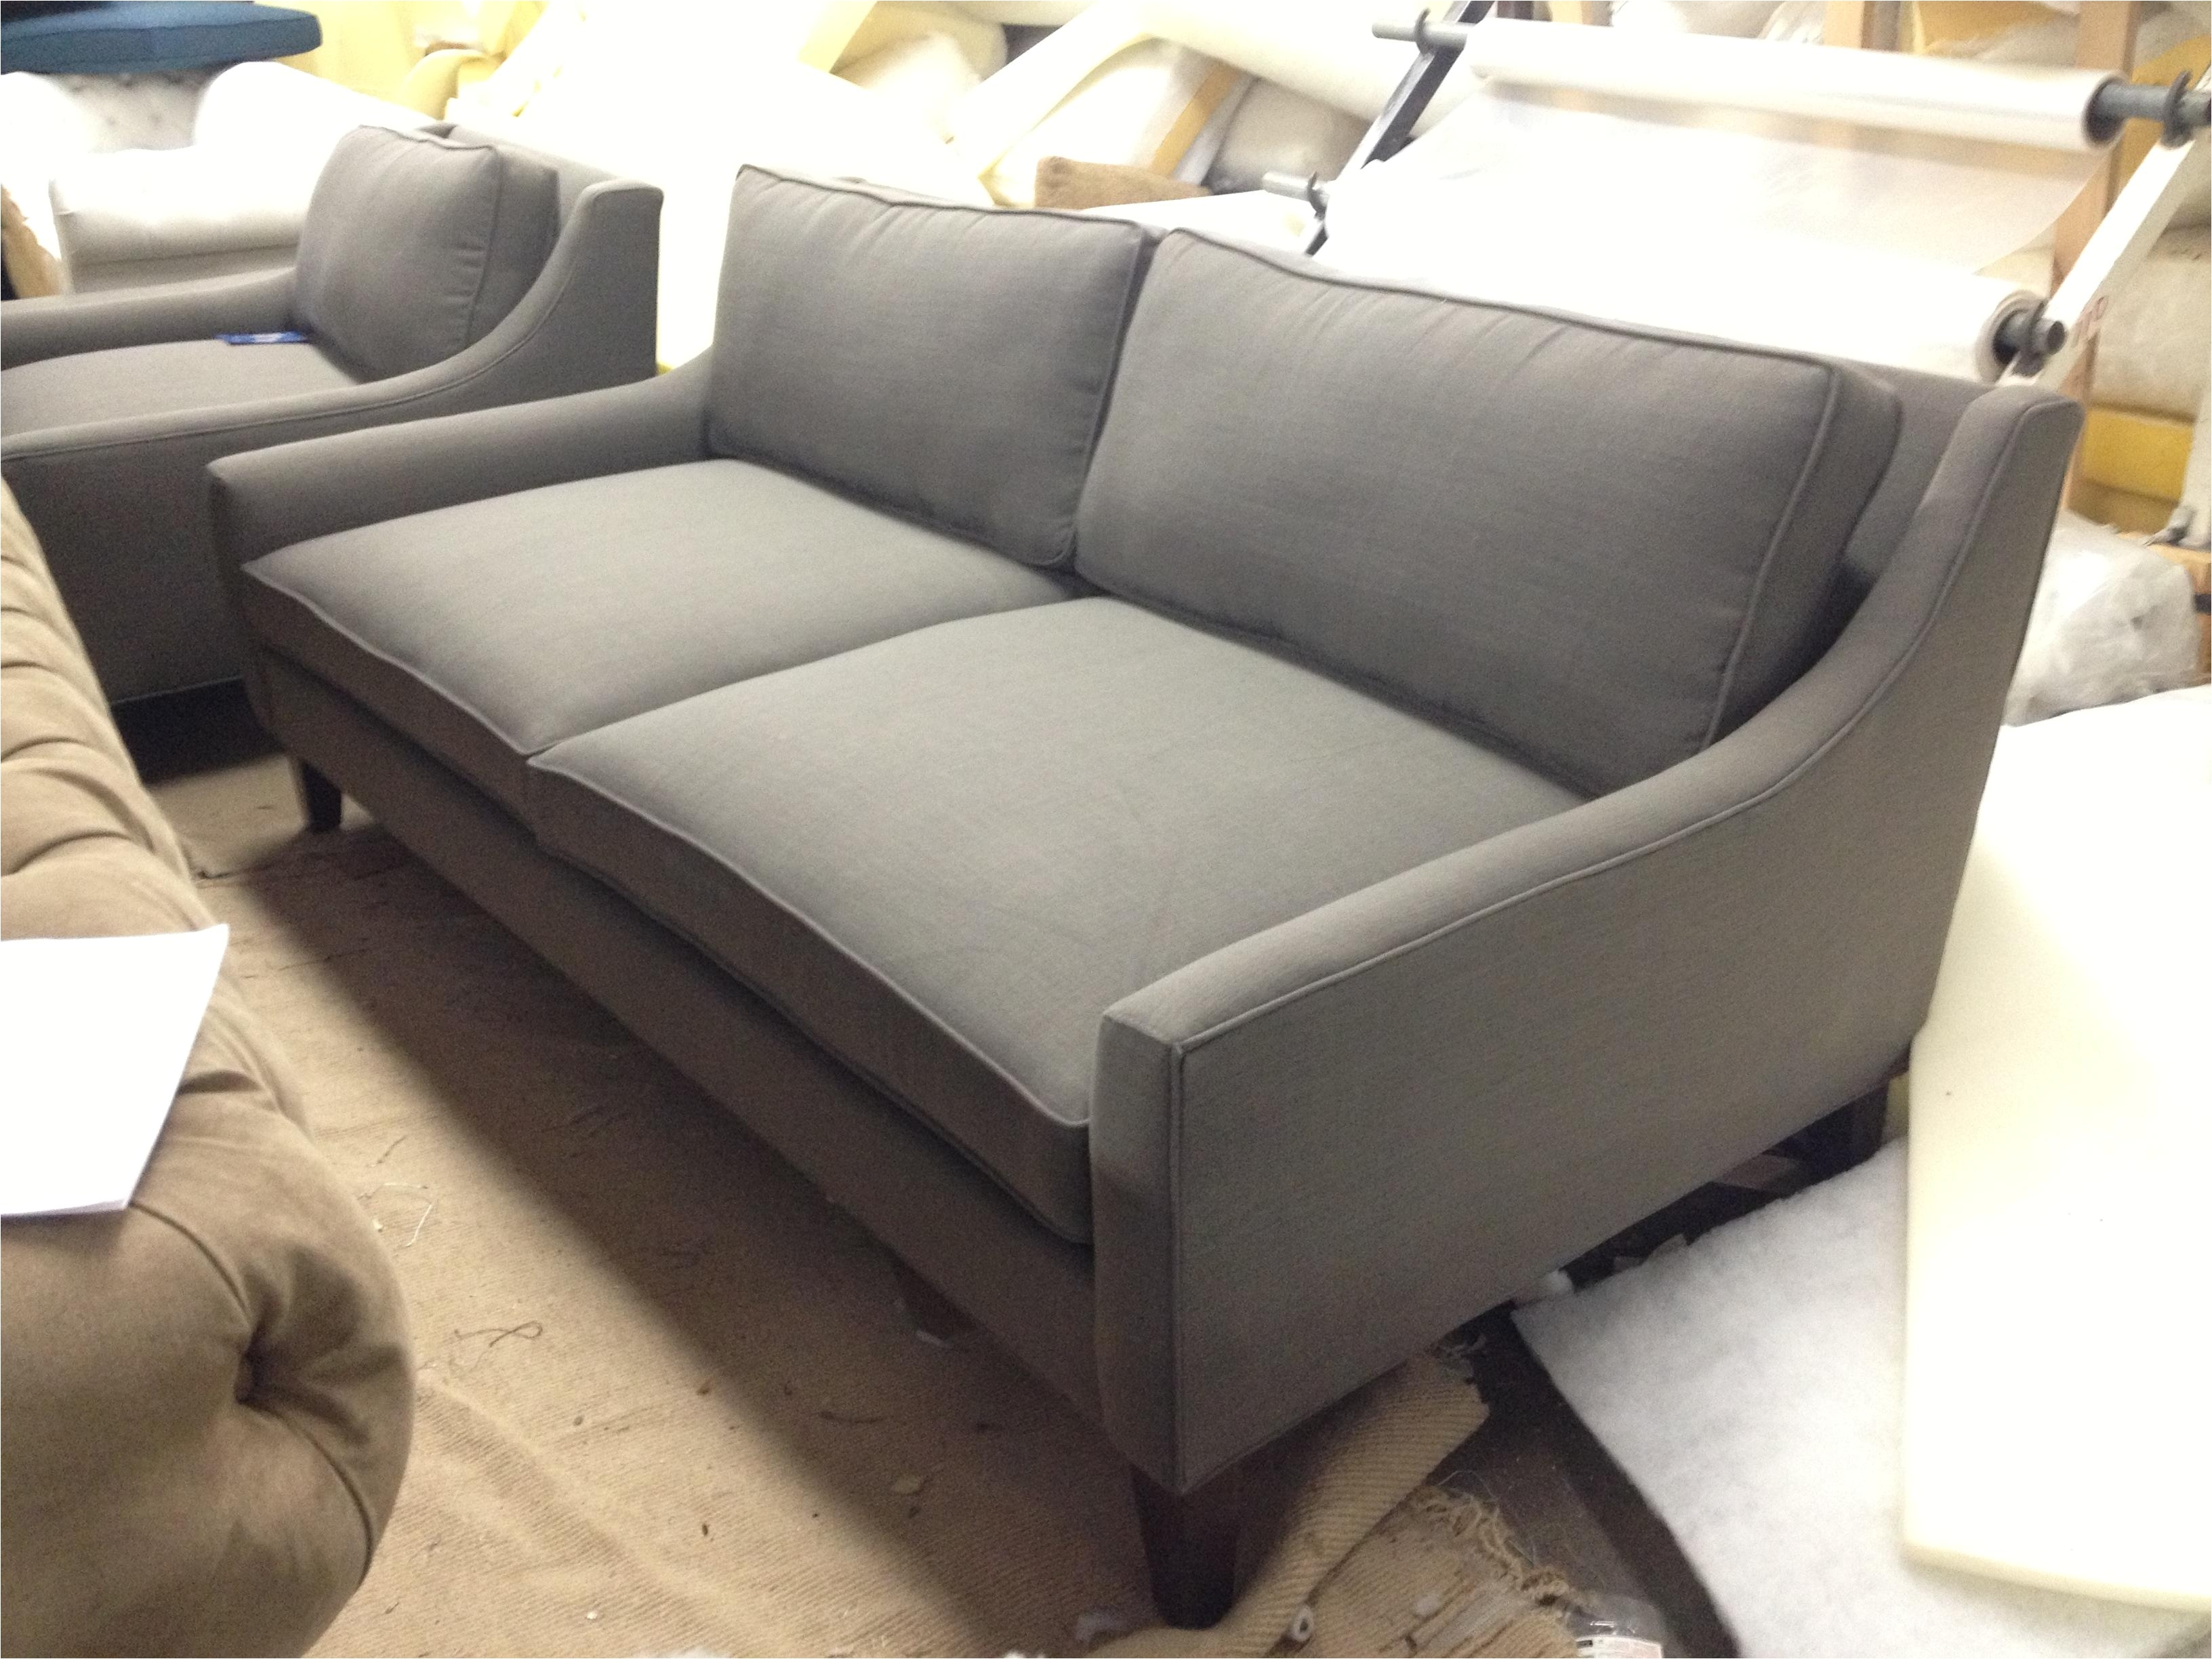 Craigslist Seattle Furniture Free Best Of Victorian Sofa For Sale  Craigslist Craigslist Seattle